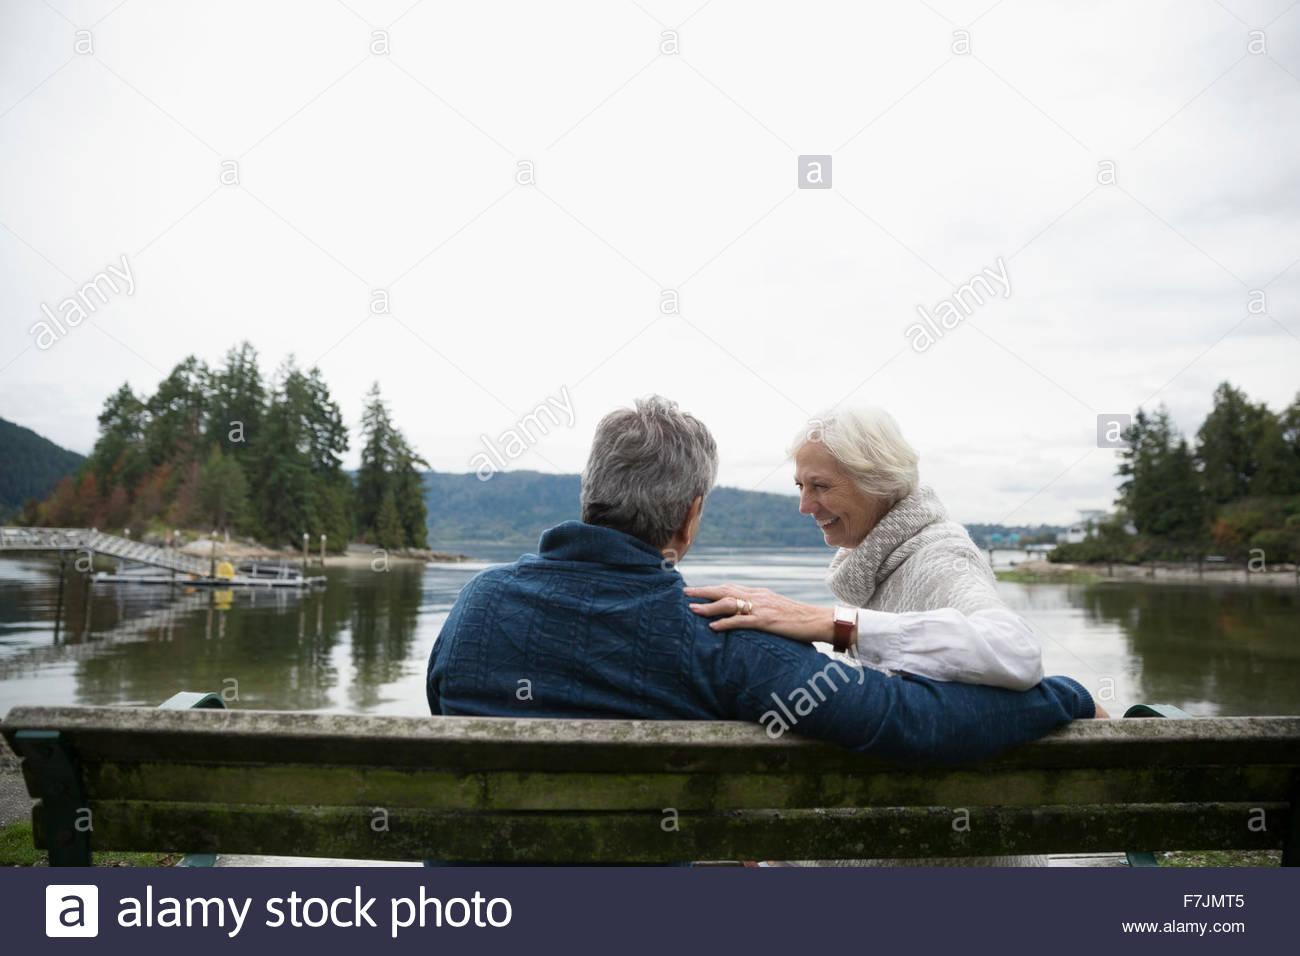 Senior couple laughing on bench overlooking lake - Stock Image